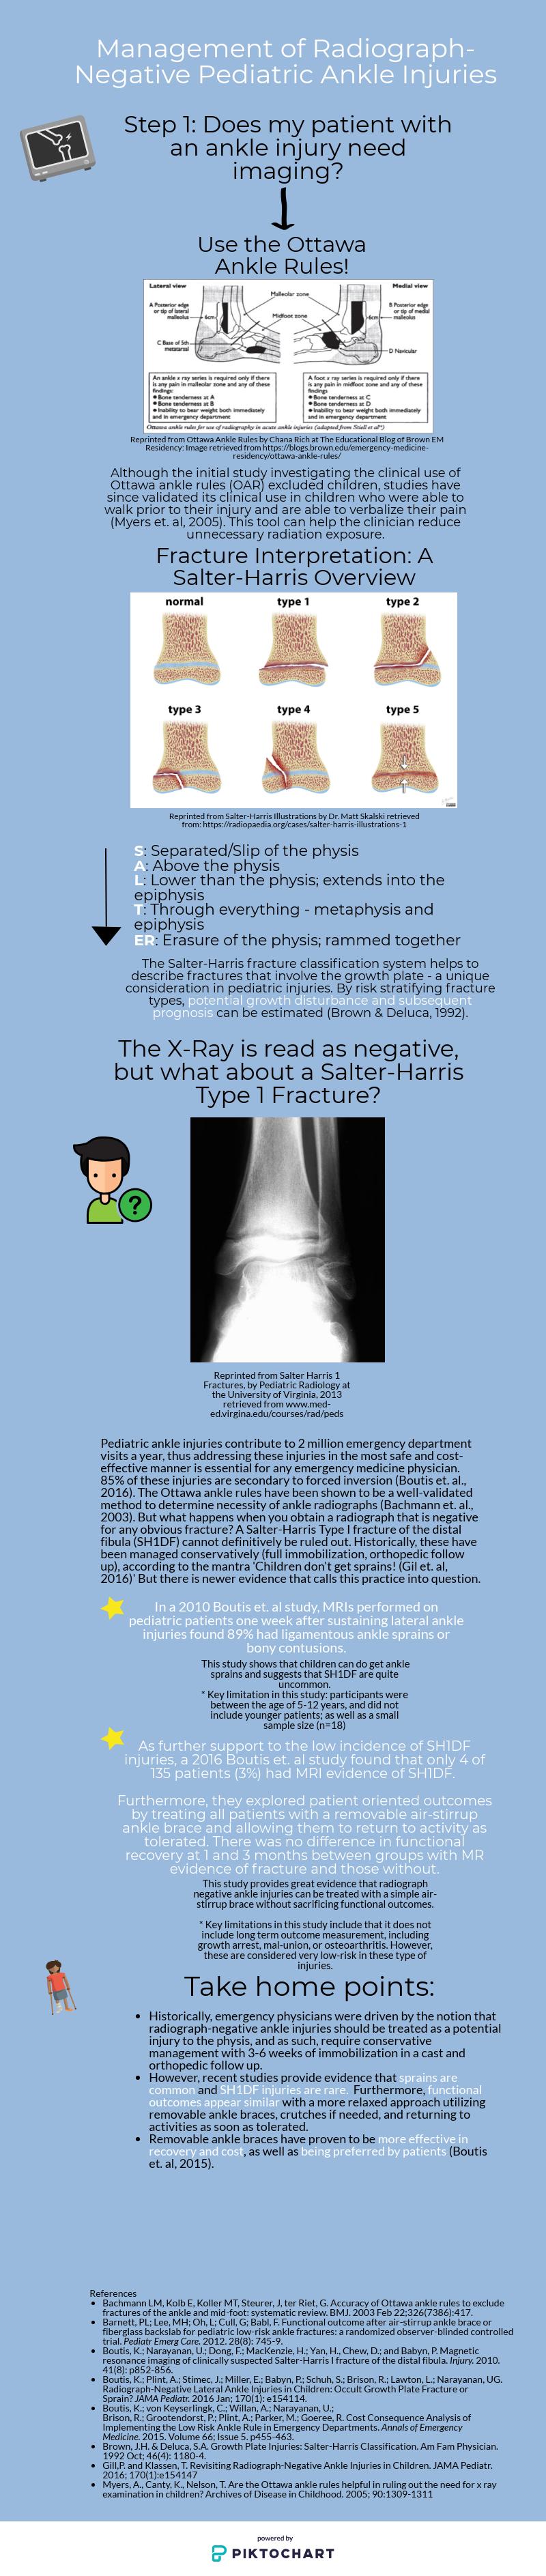 Pediatric Ankle Injuries (1).png